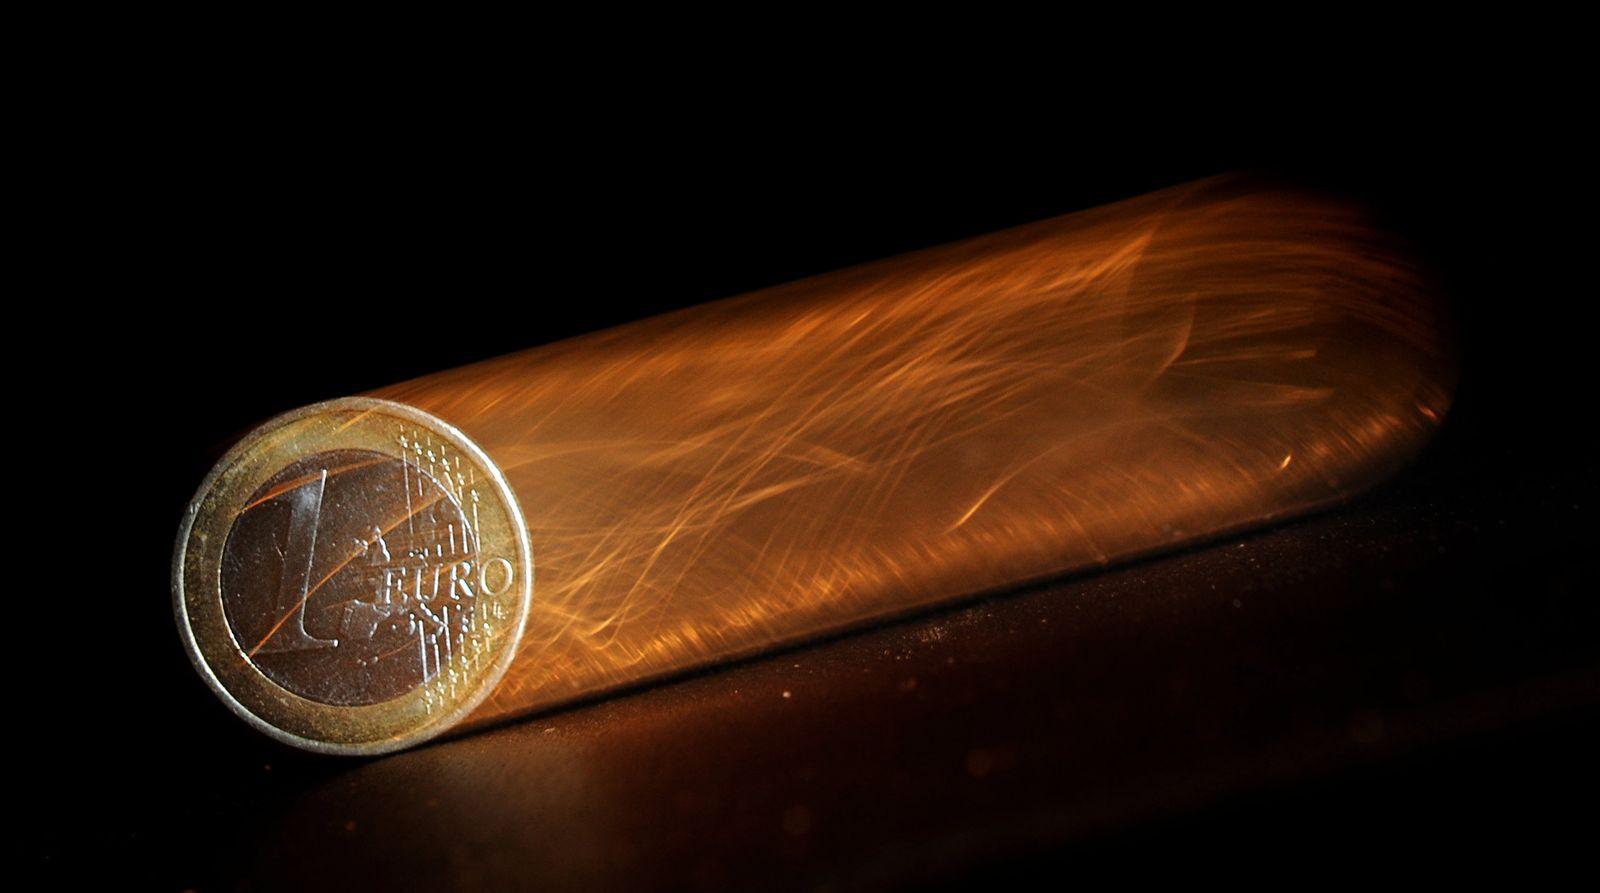 Symbolbild/ Euro/ Münze